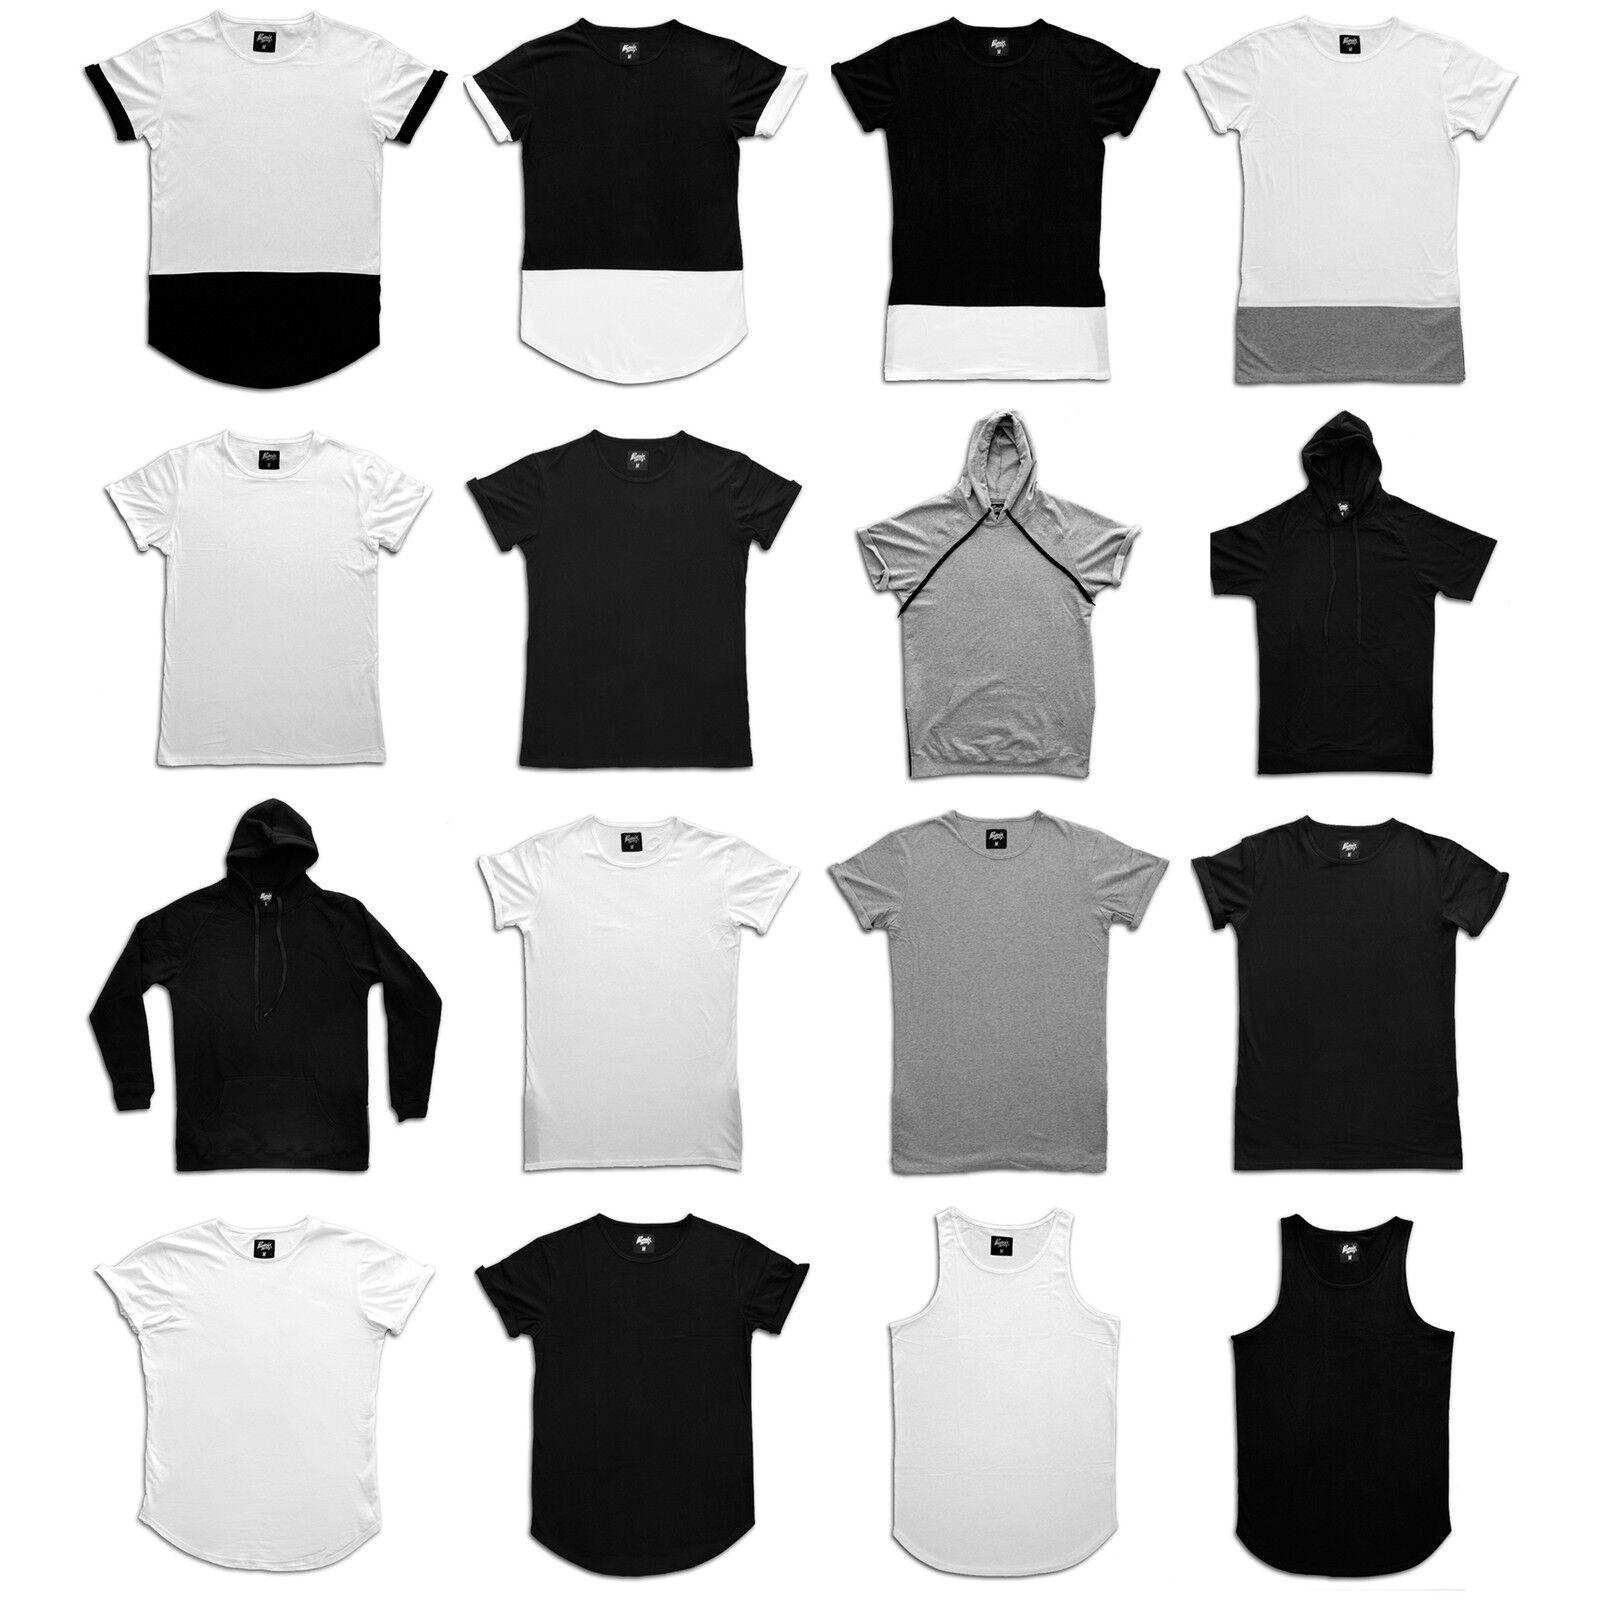 Phoenix Basics T-Shirt Hoodie Tank Top Longshirt Men's Side Zip Oversize Men